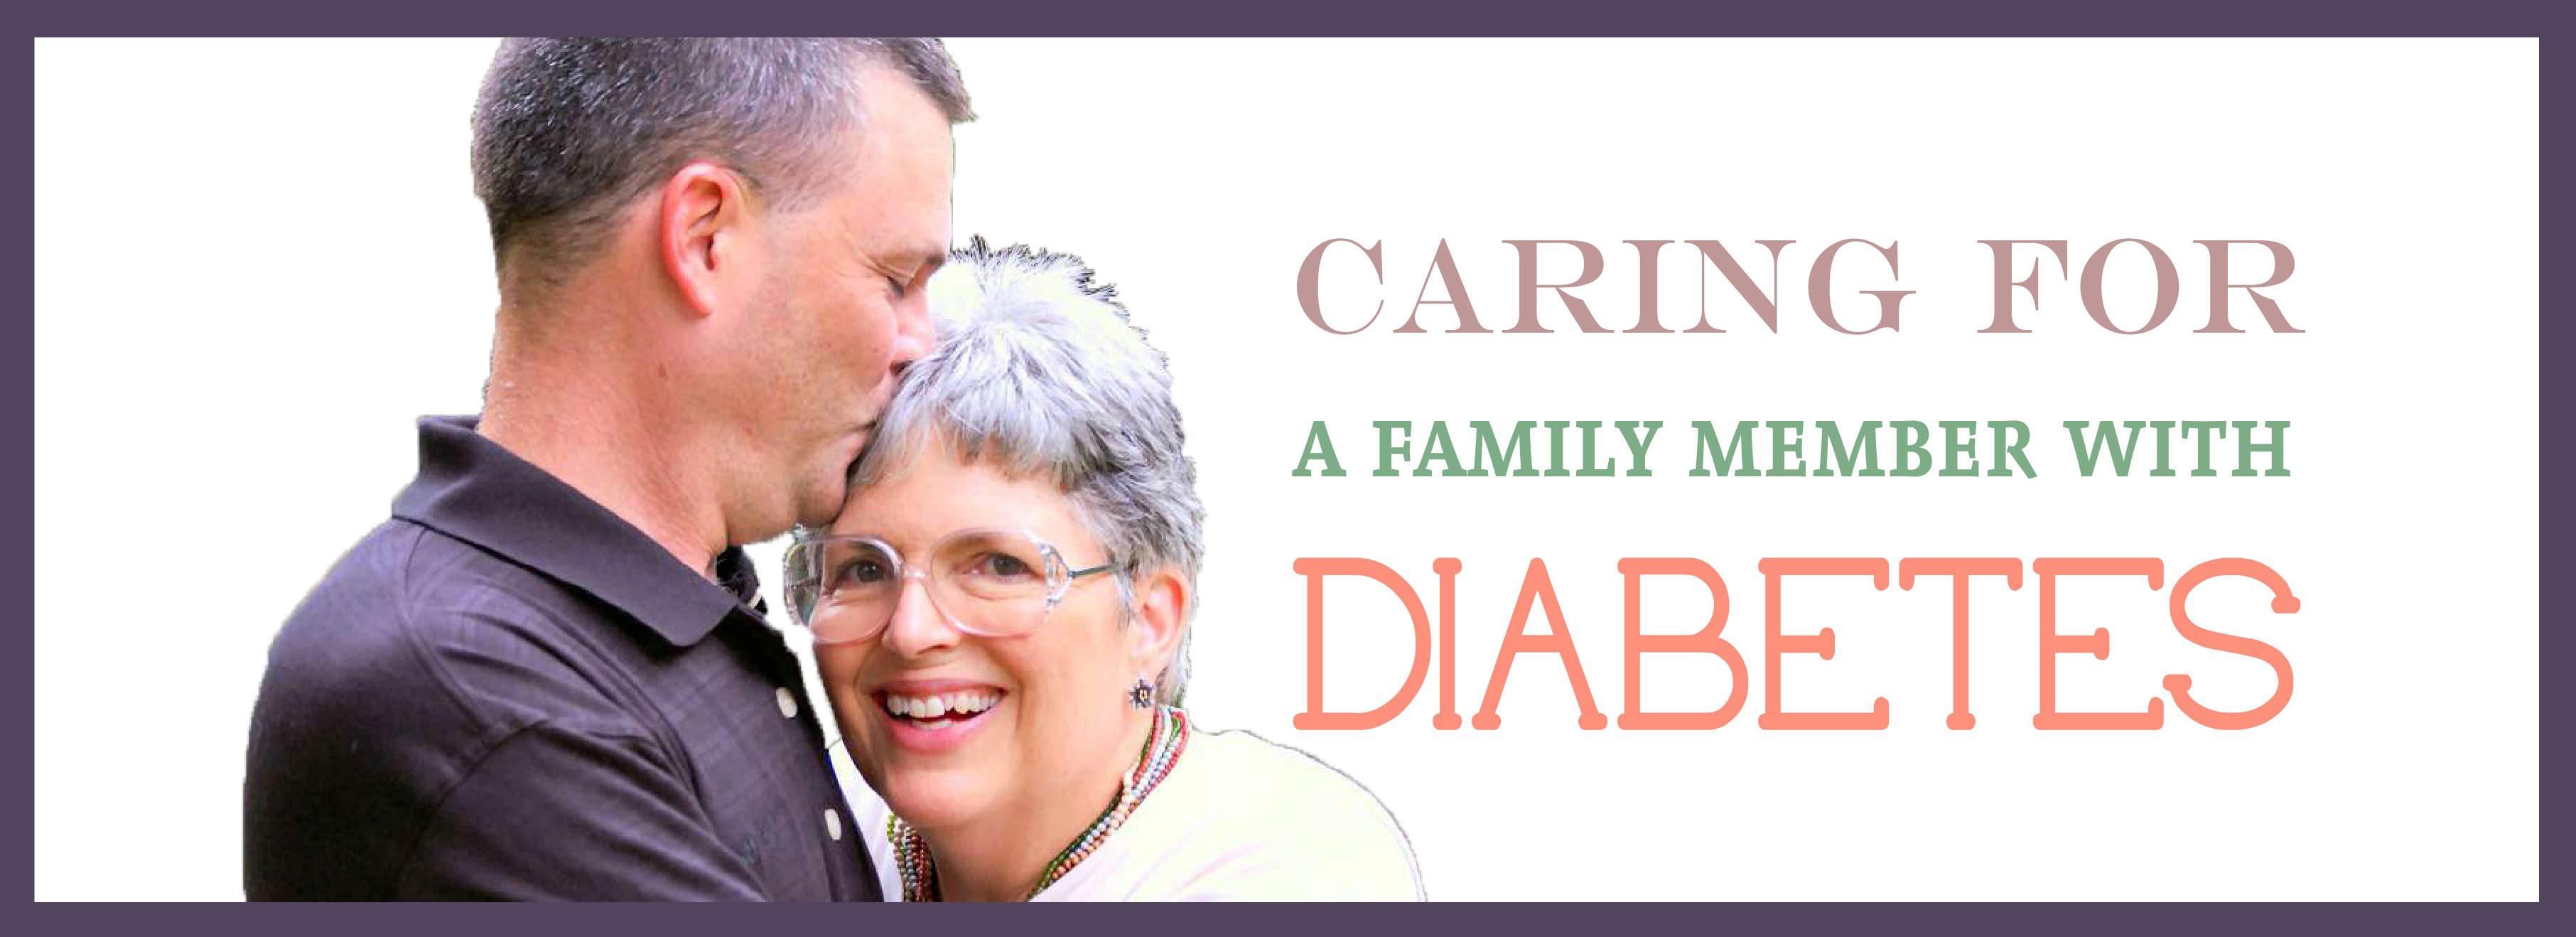 banner_diabetes_-04